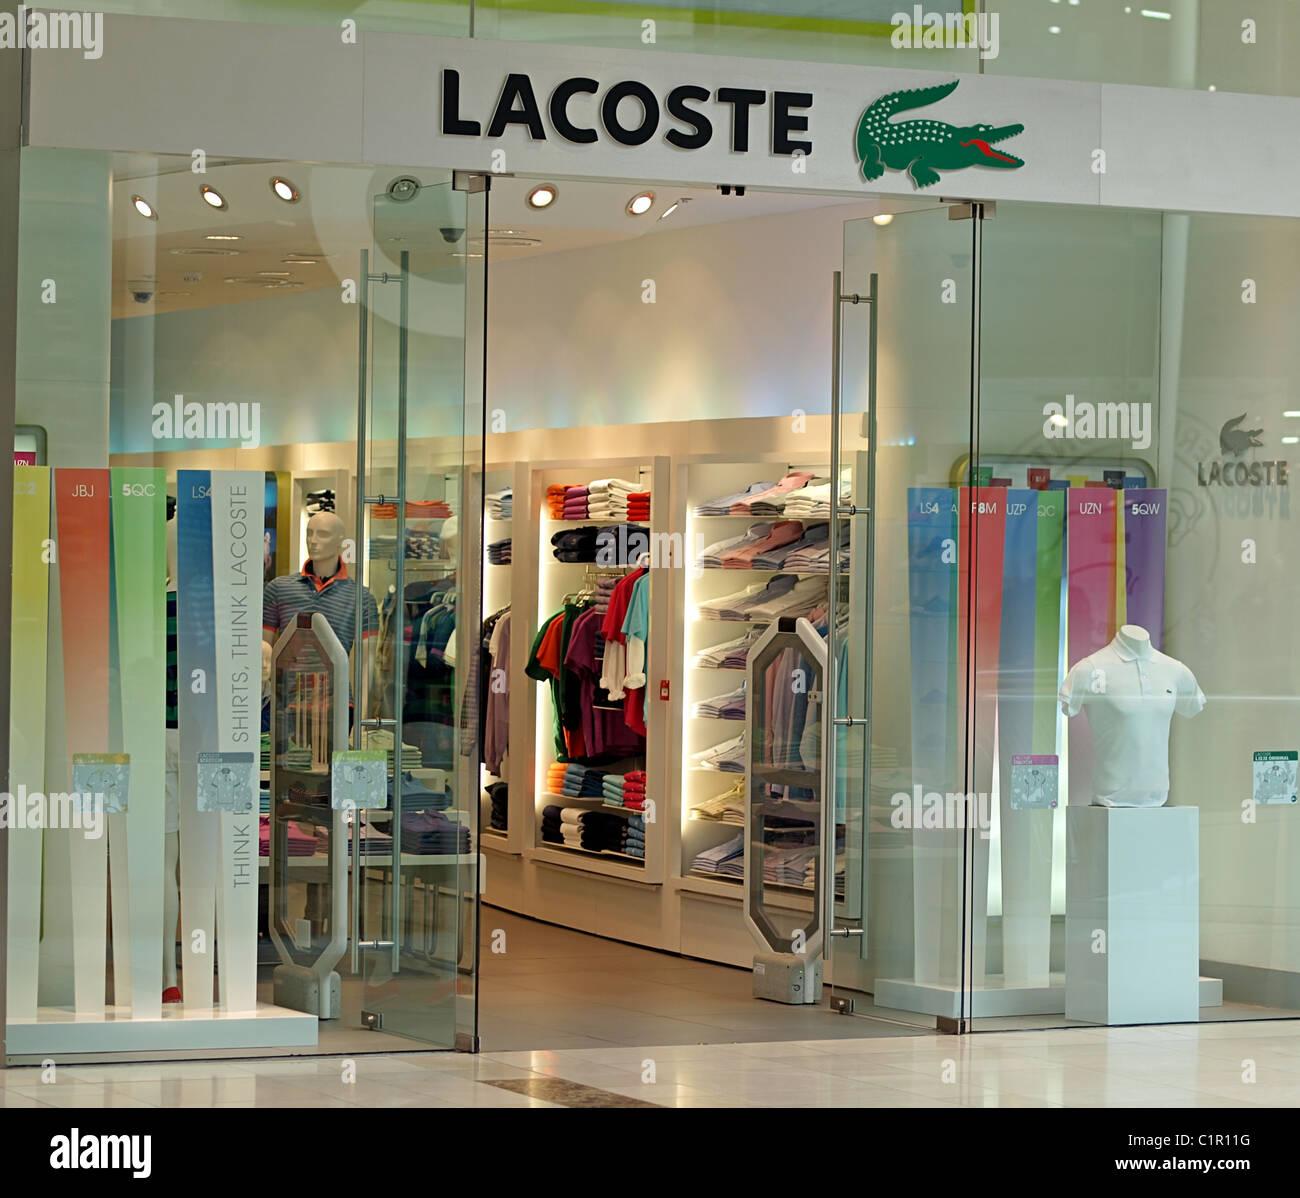 7c28592a6 Lacoste shop upper floor Westfield shopping centre